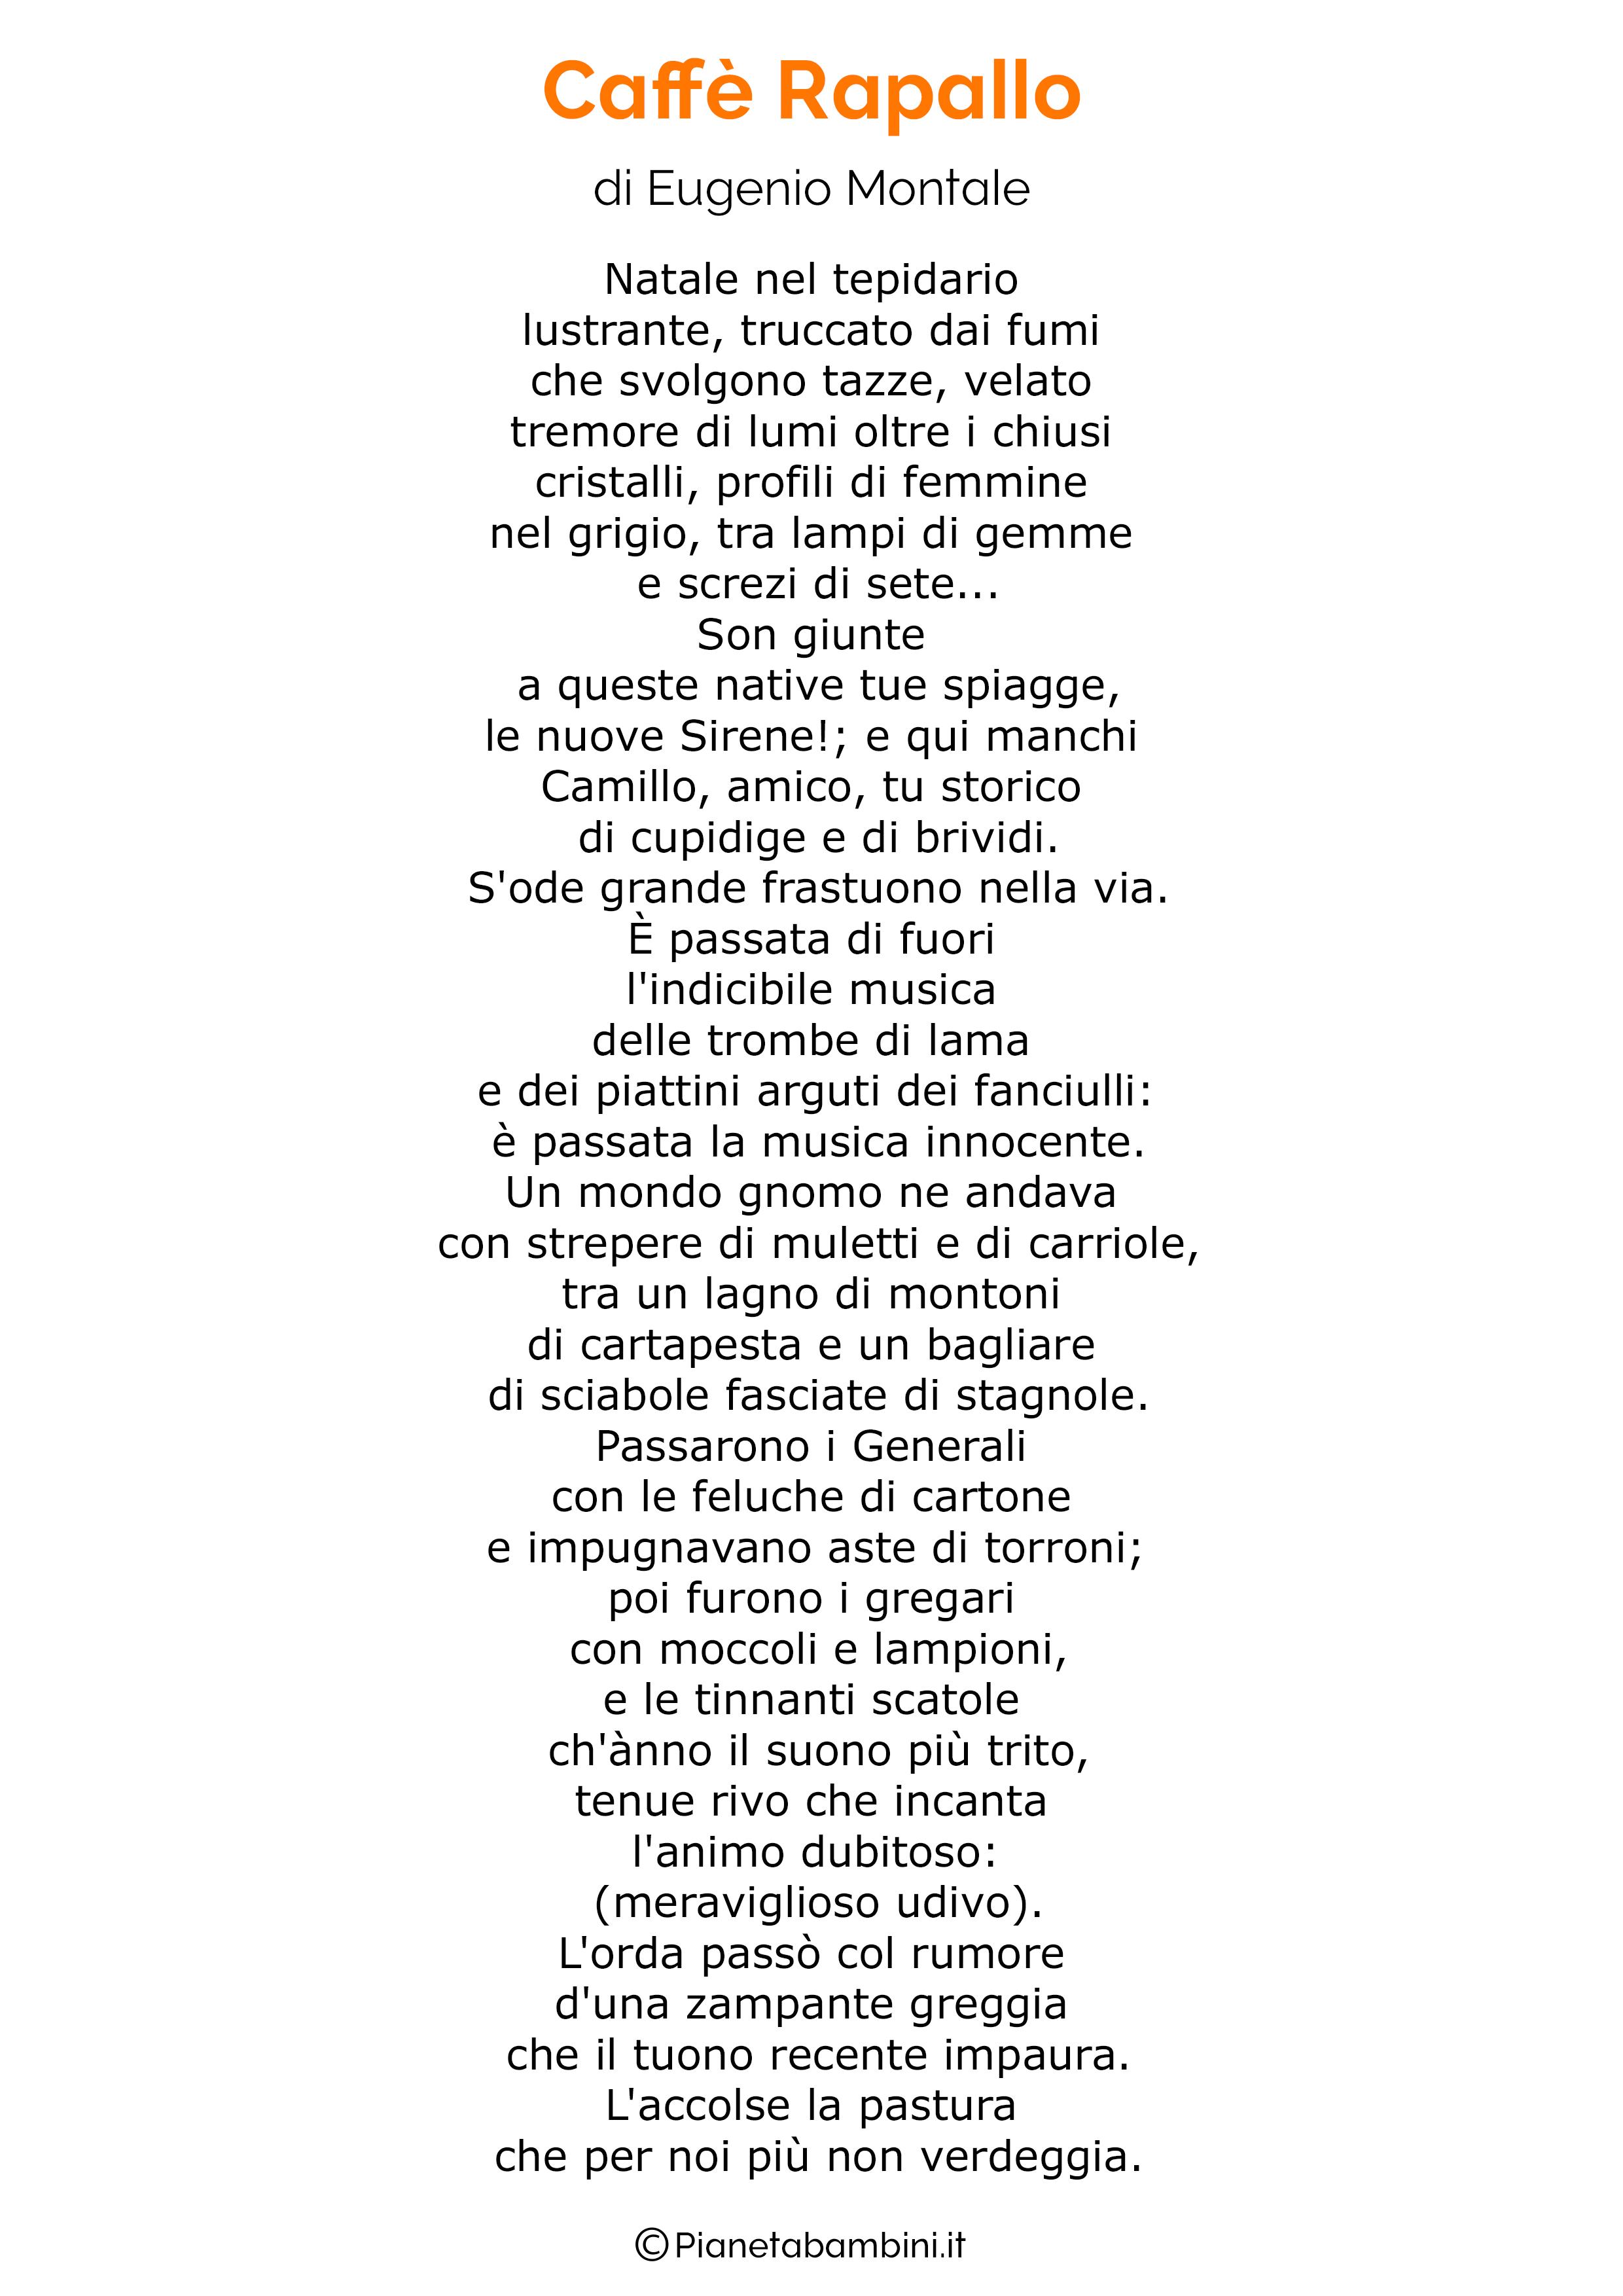 Poesia di Natale autori classici 02